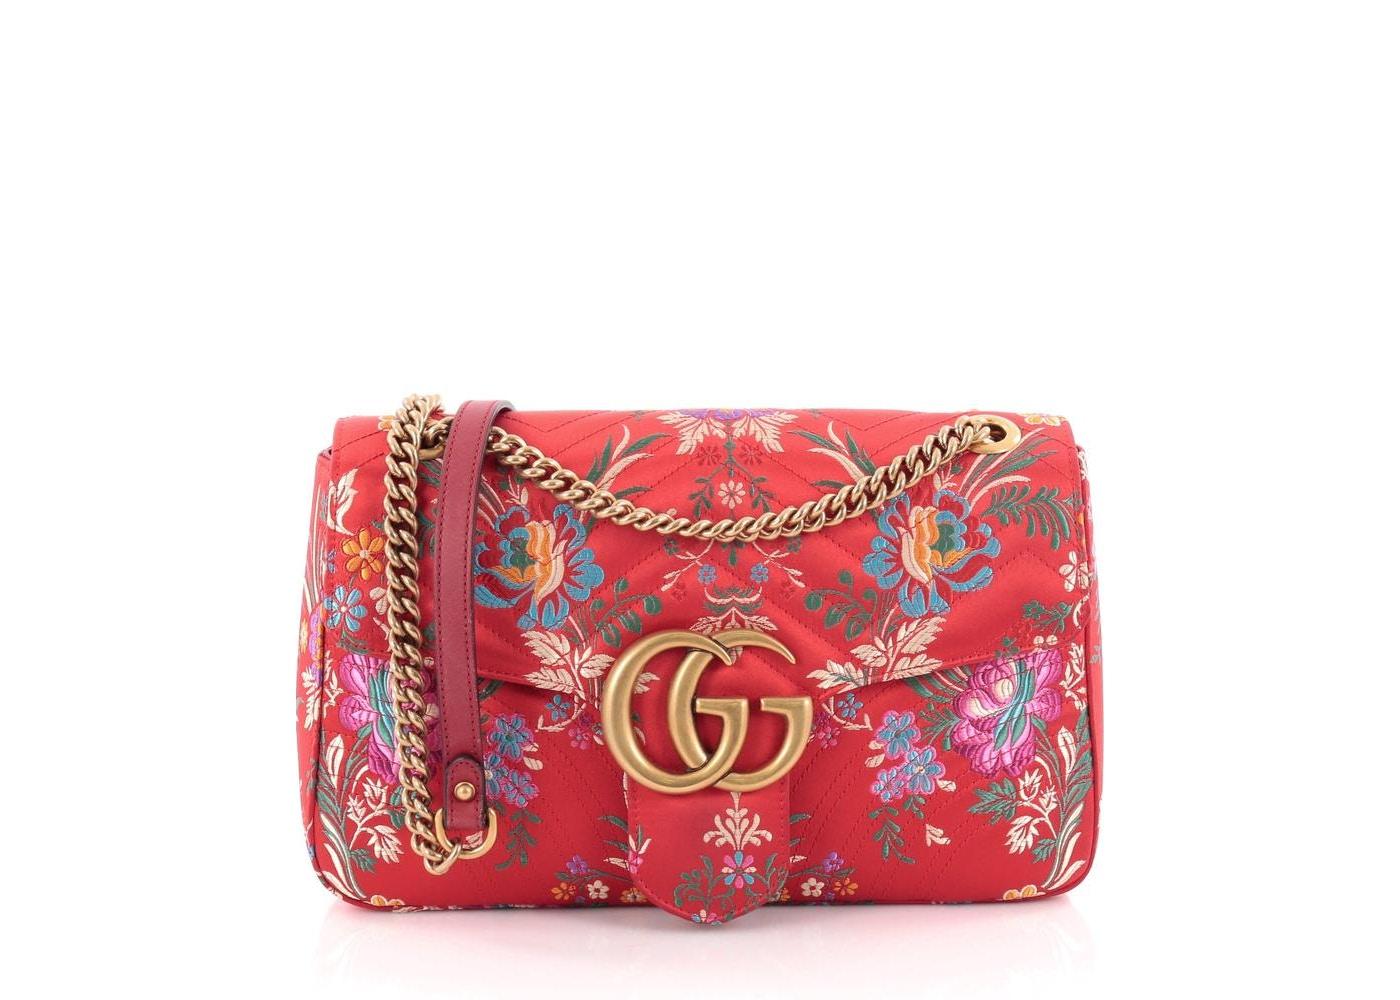 fe45036185bd Gucci Marmont Matelasse Floral Jacquard Interlocking GG Logo ...